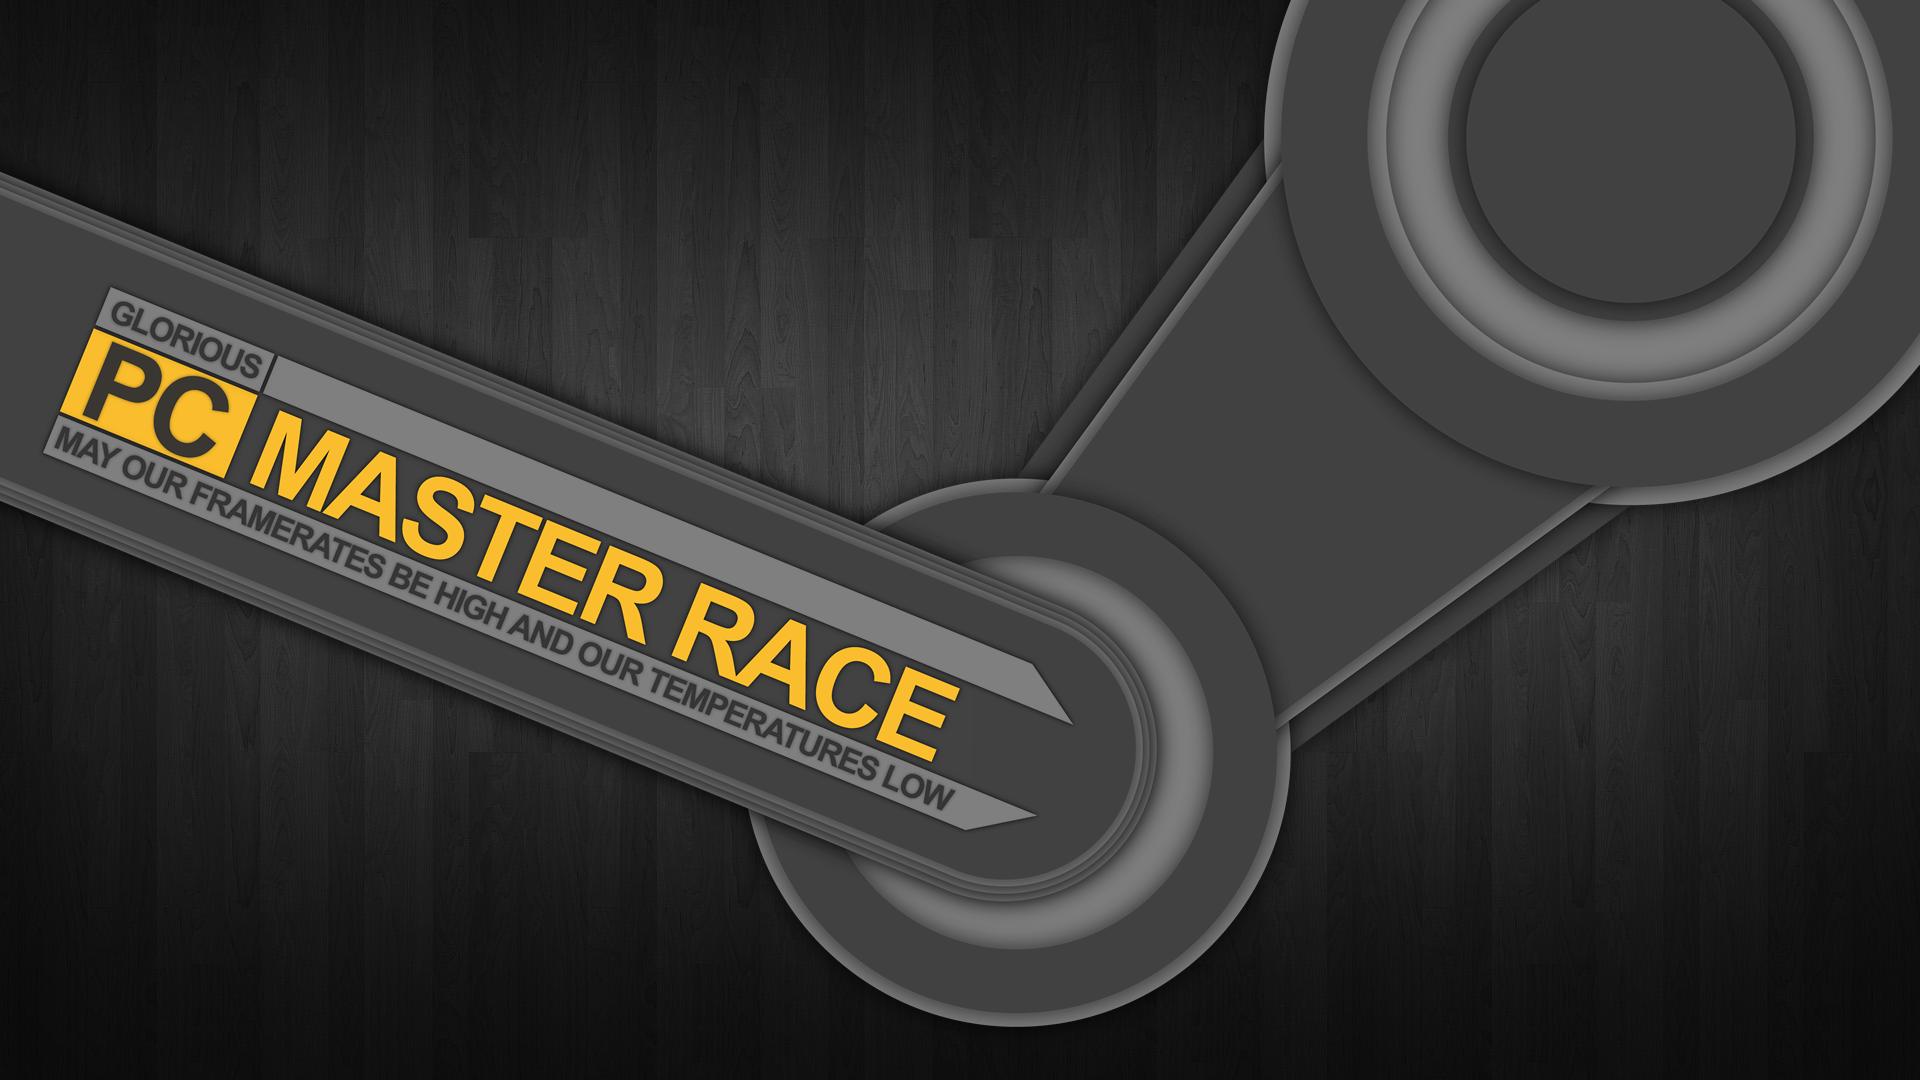 Free Download Glorious Pc Gaming Master Race 1080p Wallpaper